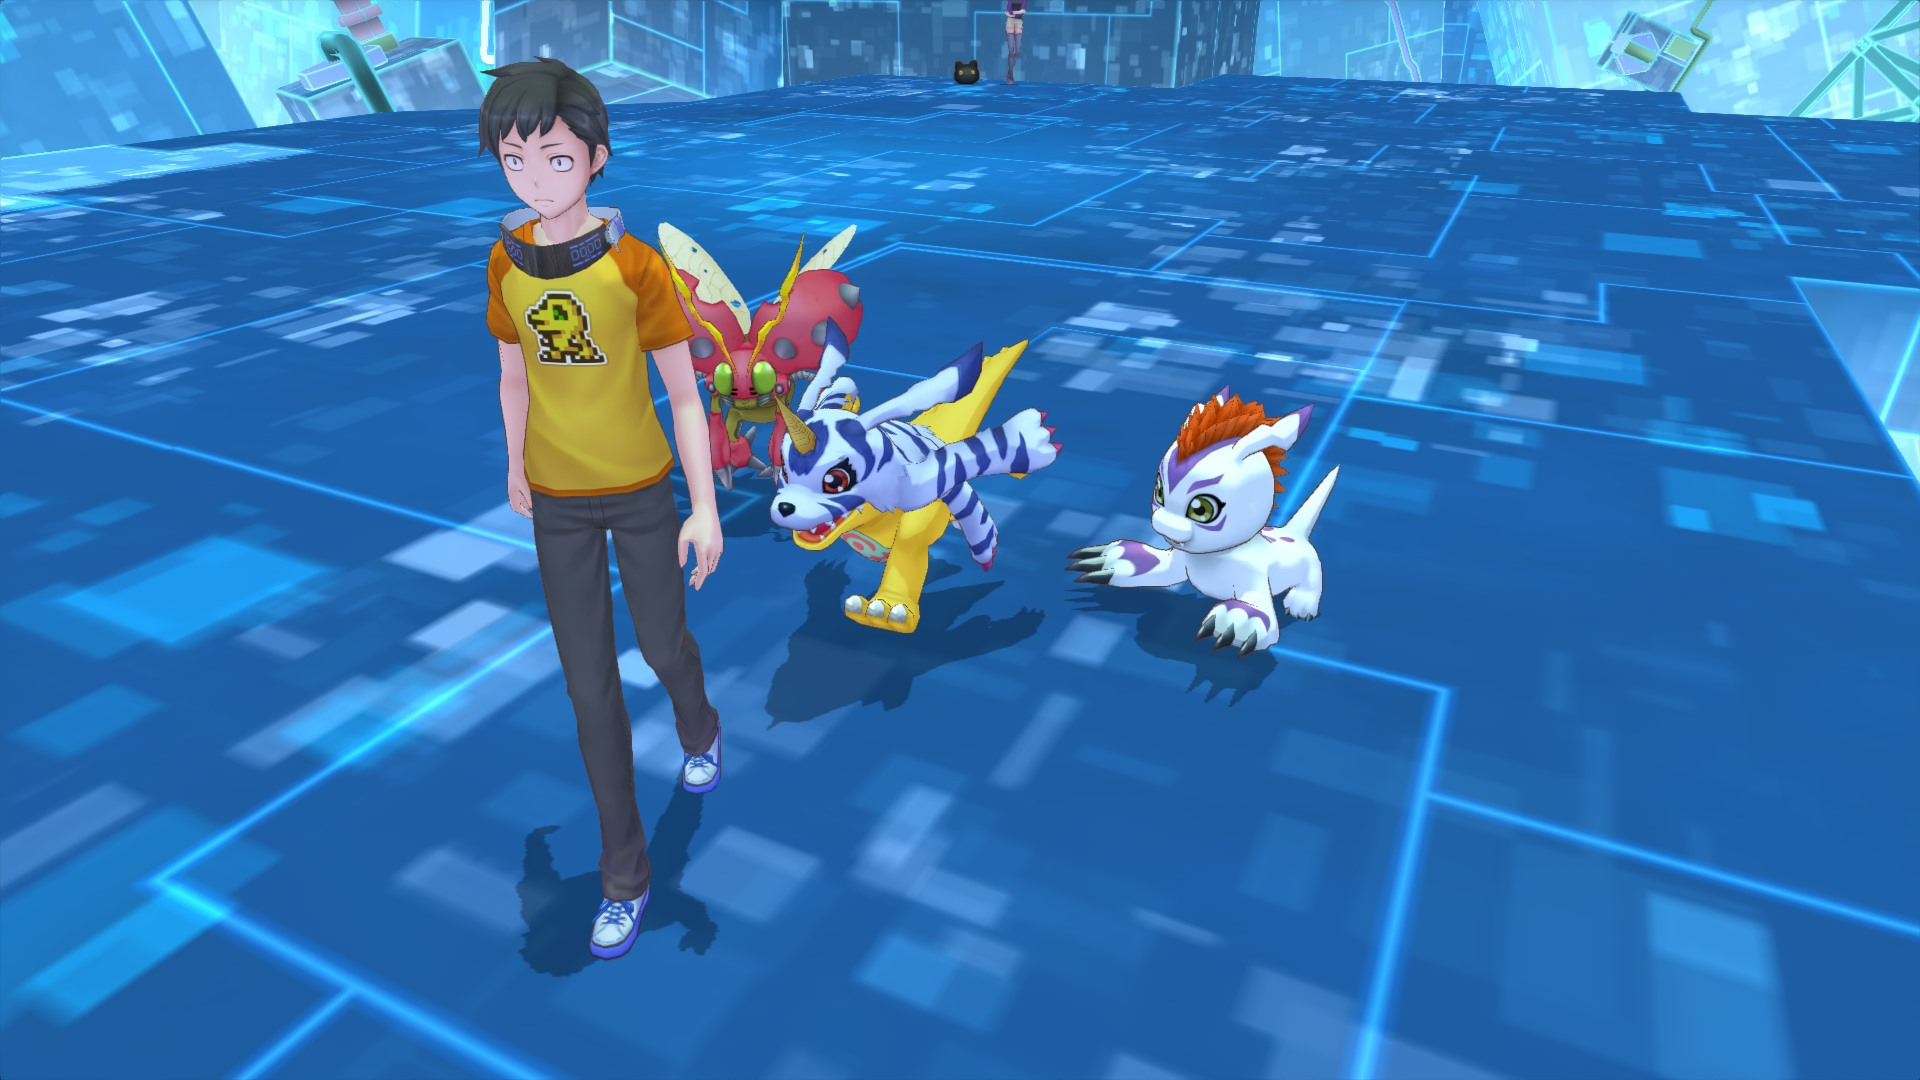 3rd Strike Com Digimon Story Cyber Sleuth Hacker S Memory